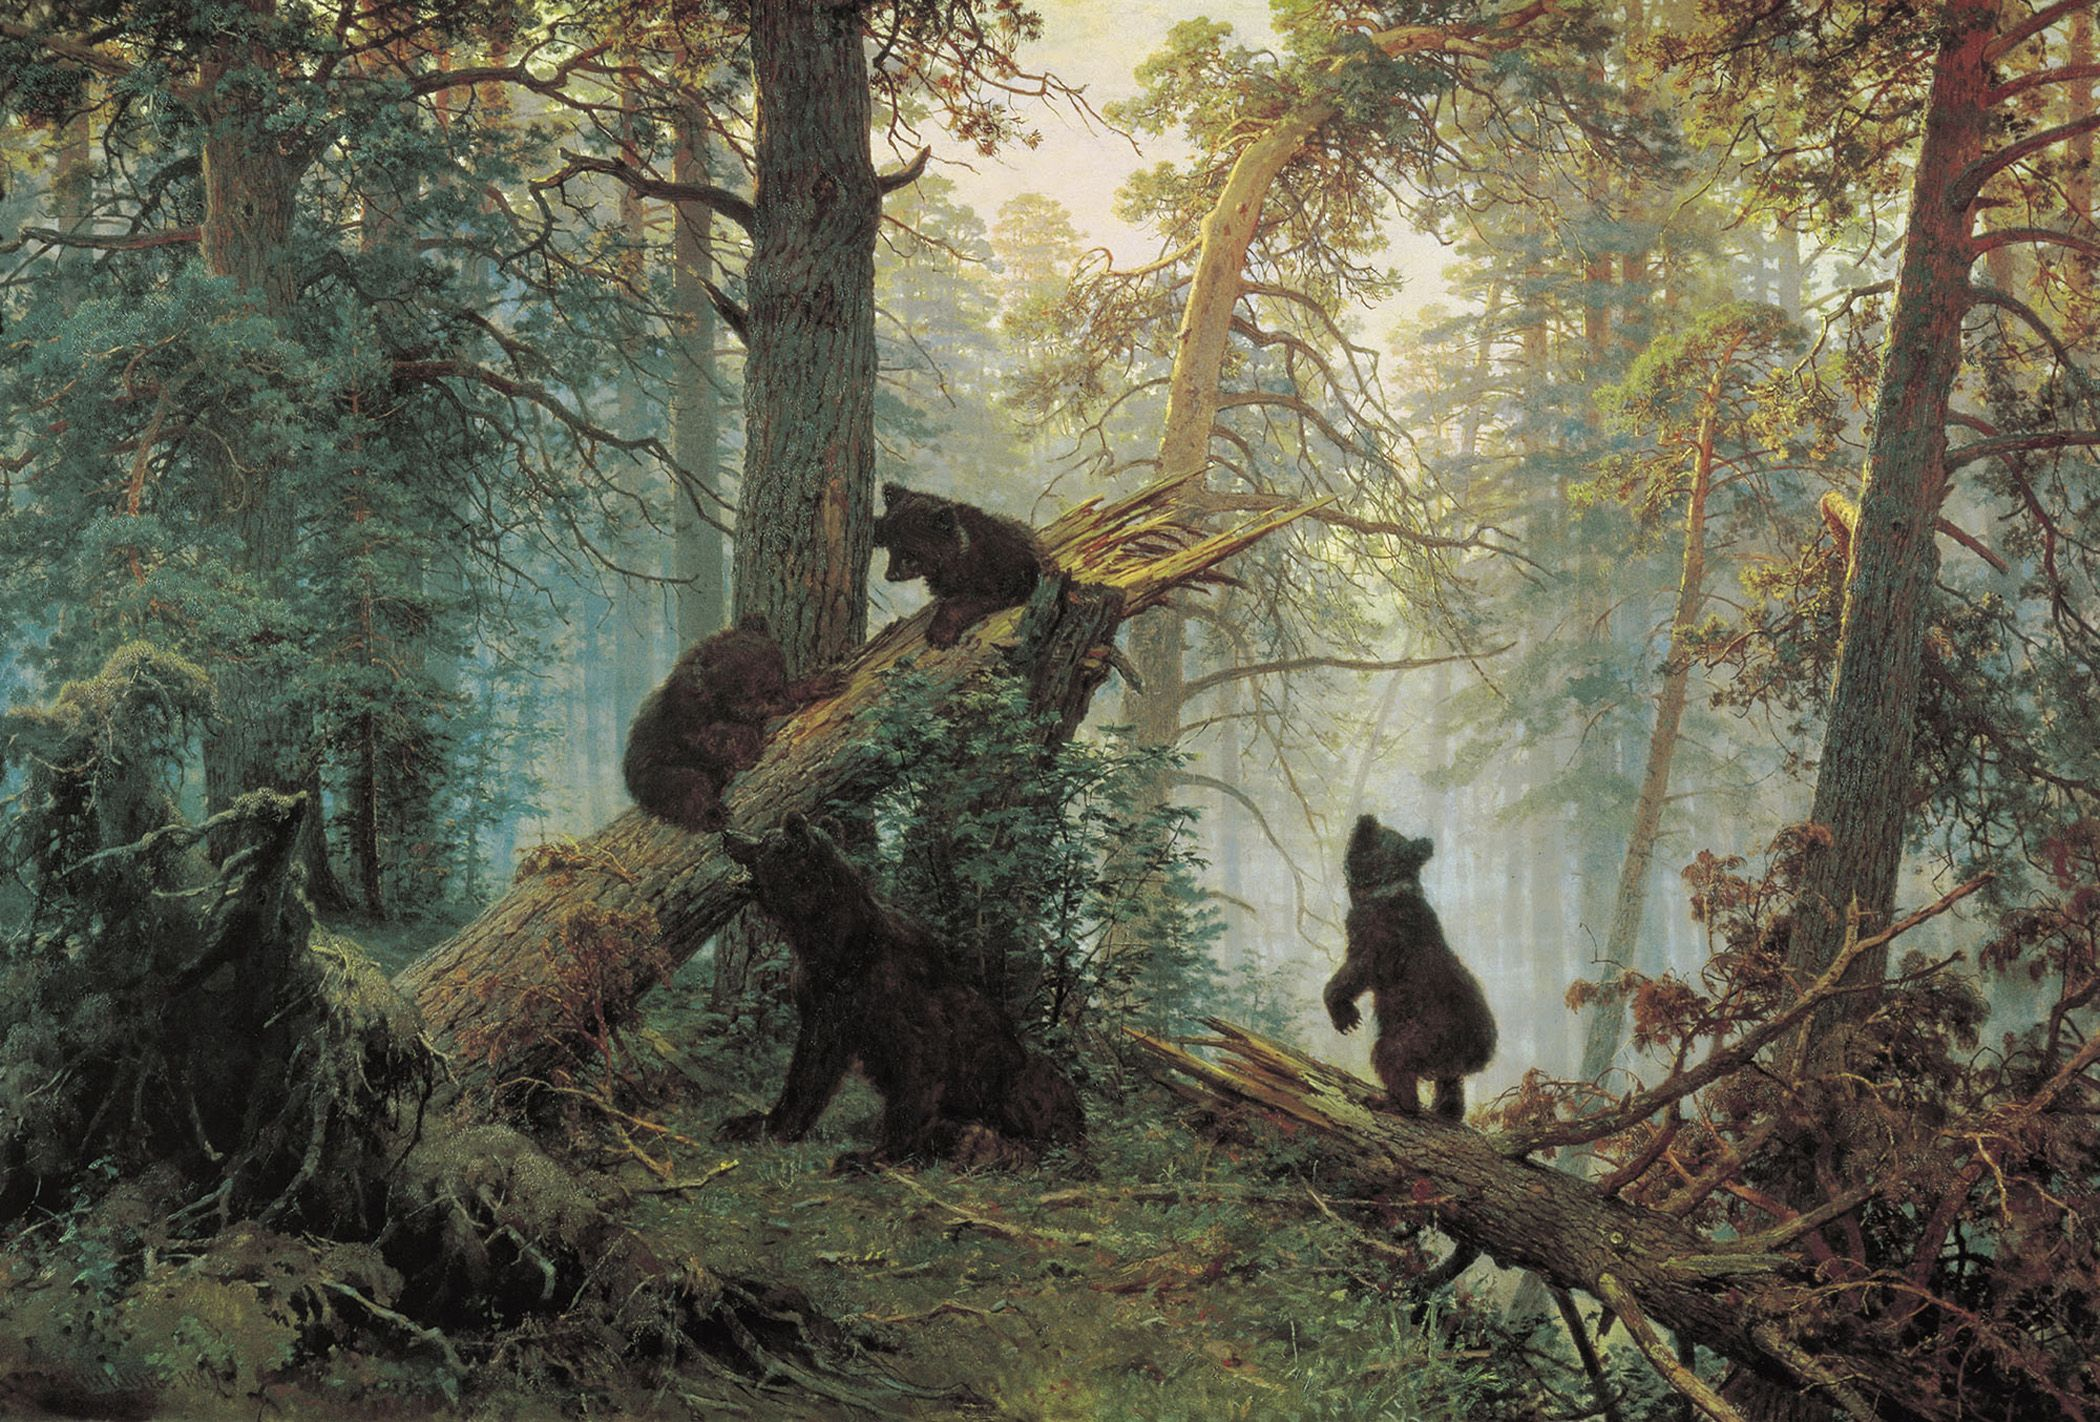 shishkin_ivan_1_morning_in_a_pine_forest.jpg (2100×1422)